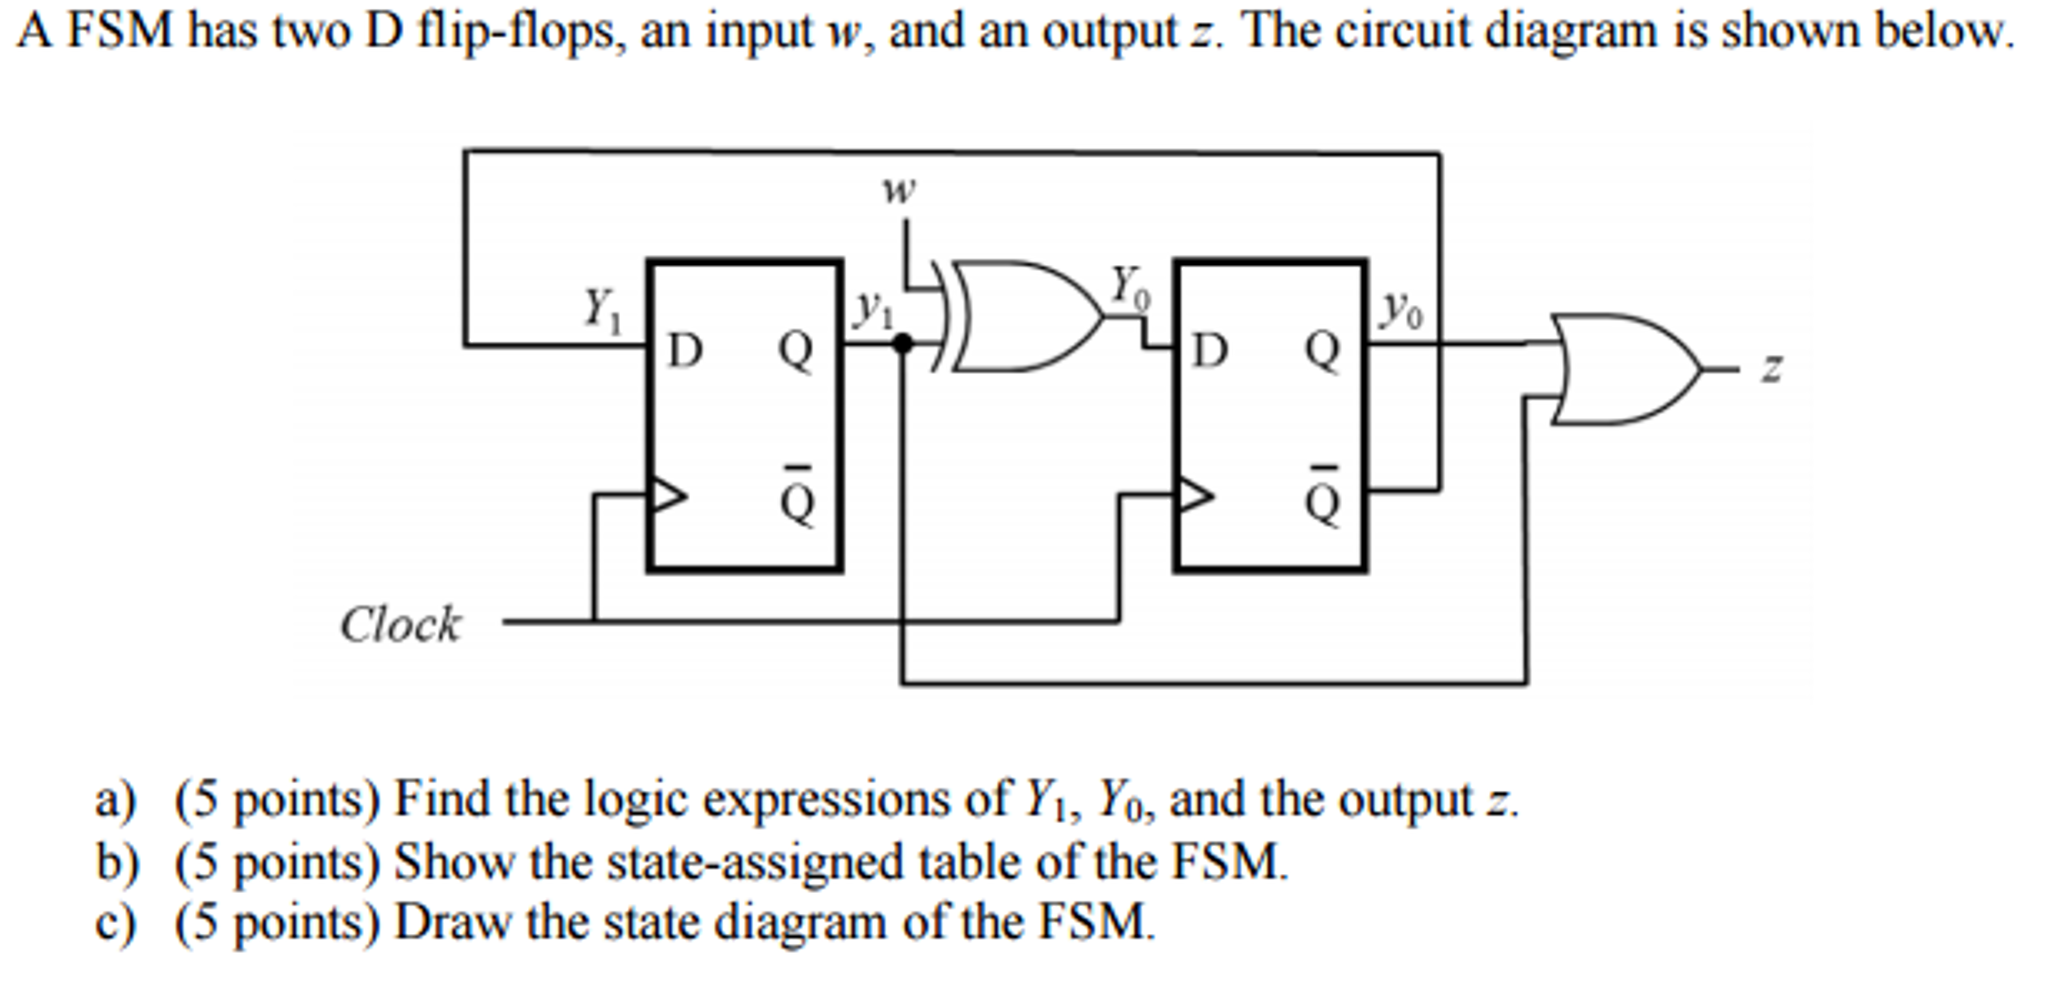 A FSM has two D flip-flops, an input w, and an out